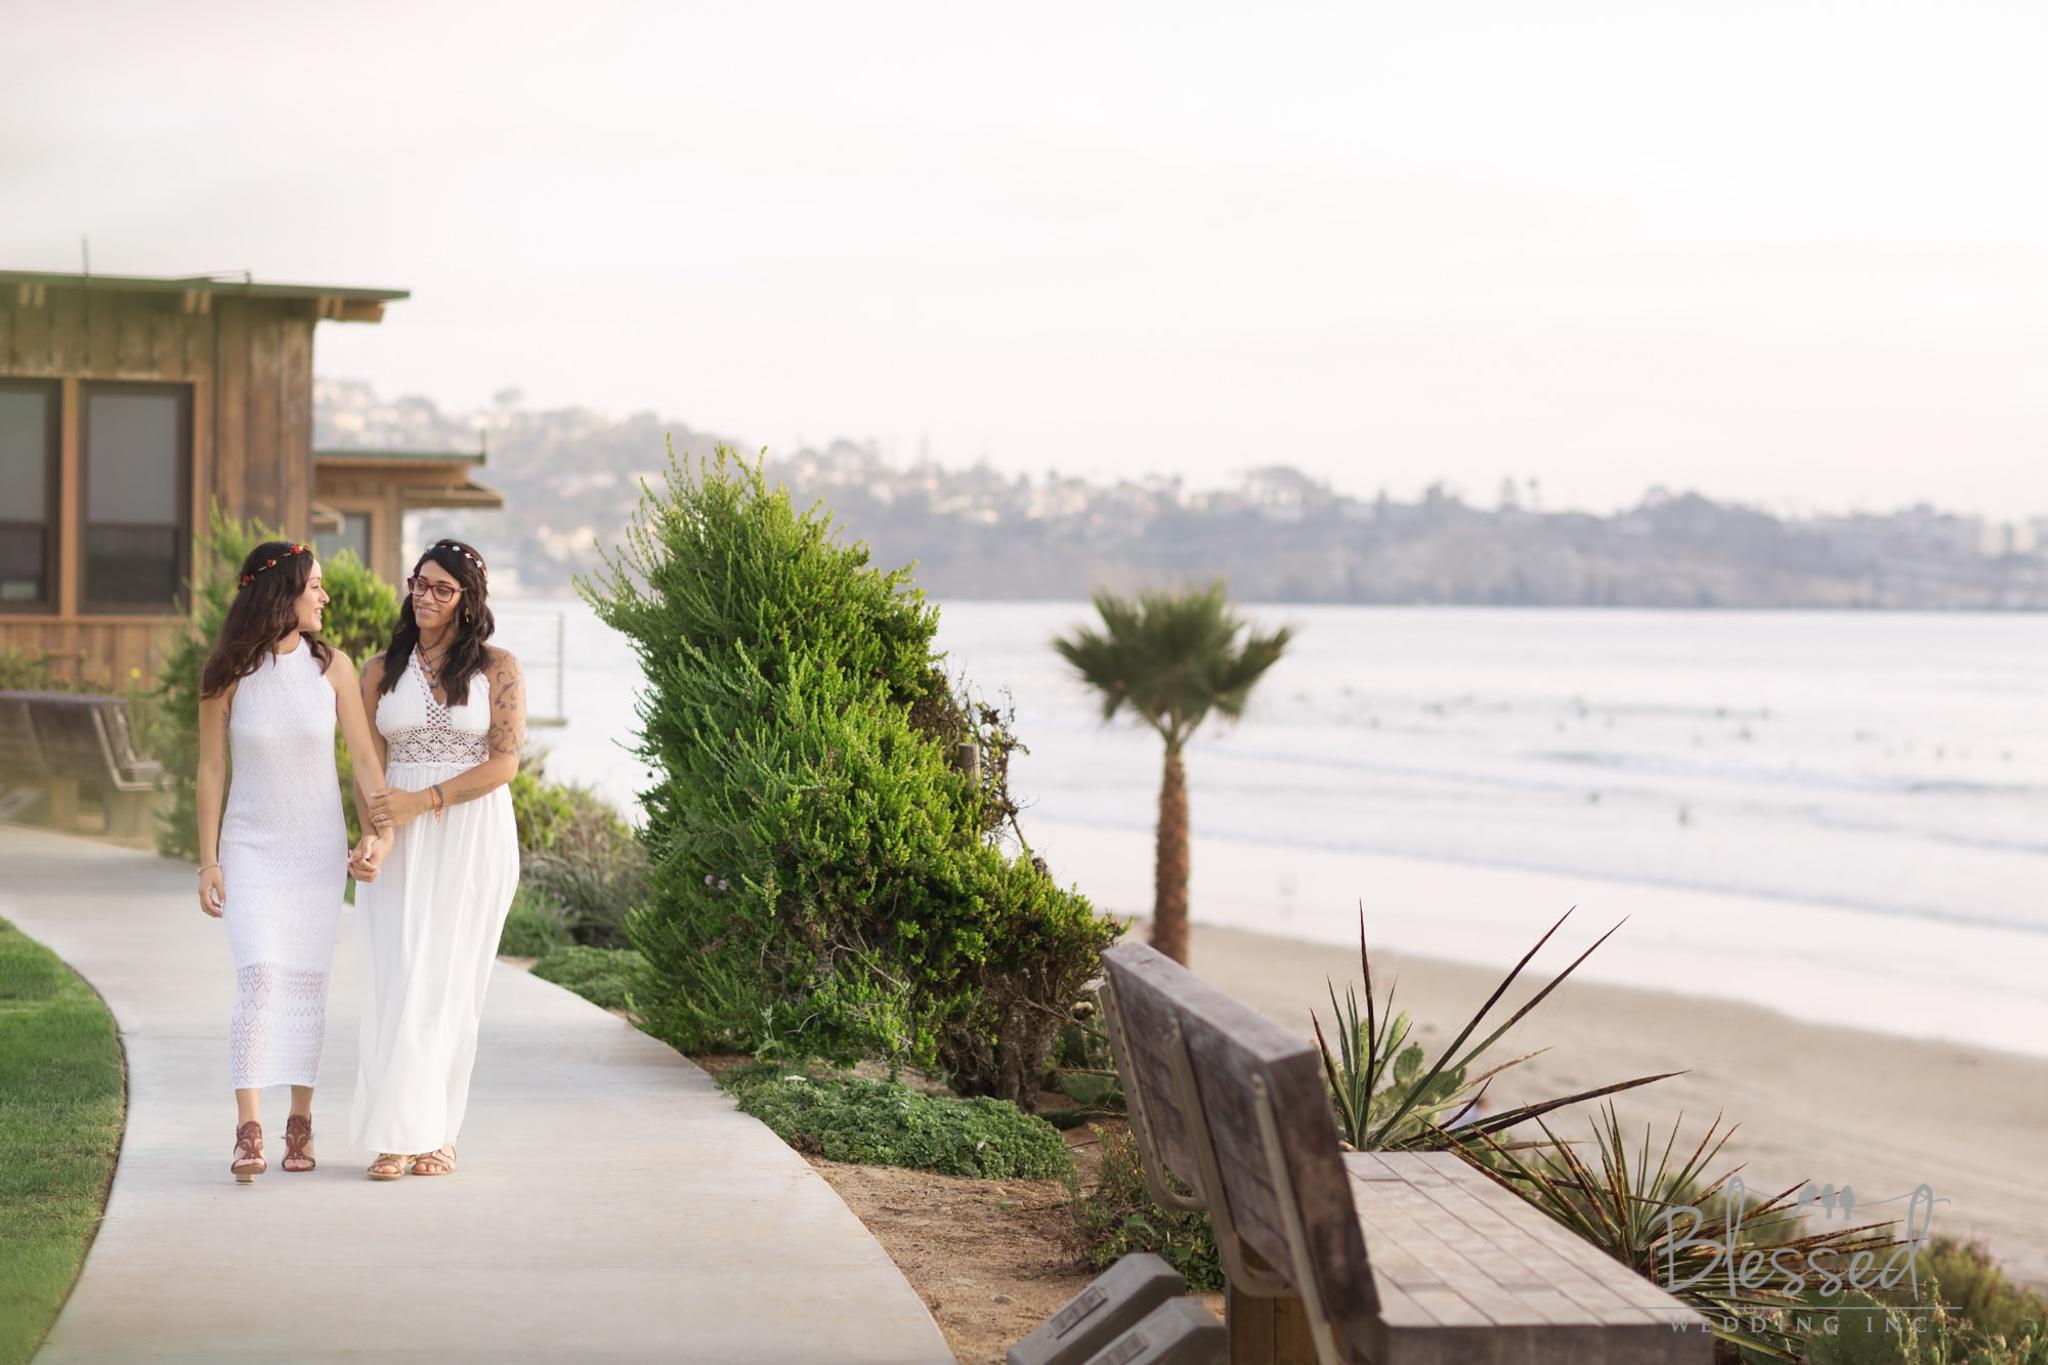 La Jolla Beach Engagement Session by San Diego Wedding Photographers Blessed Wedding-32.jpg